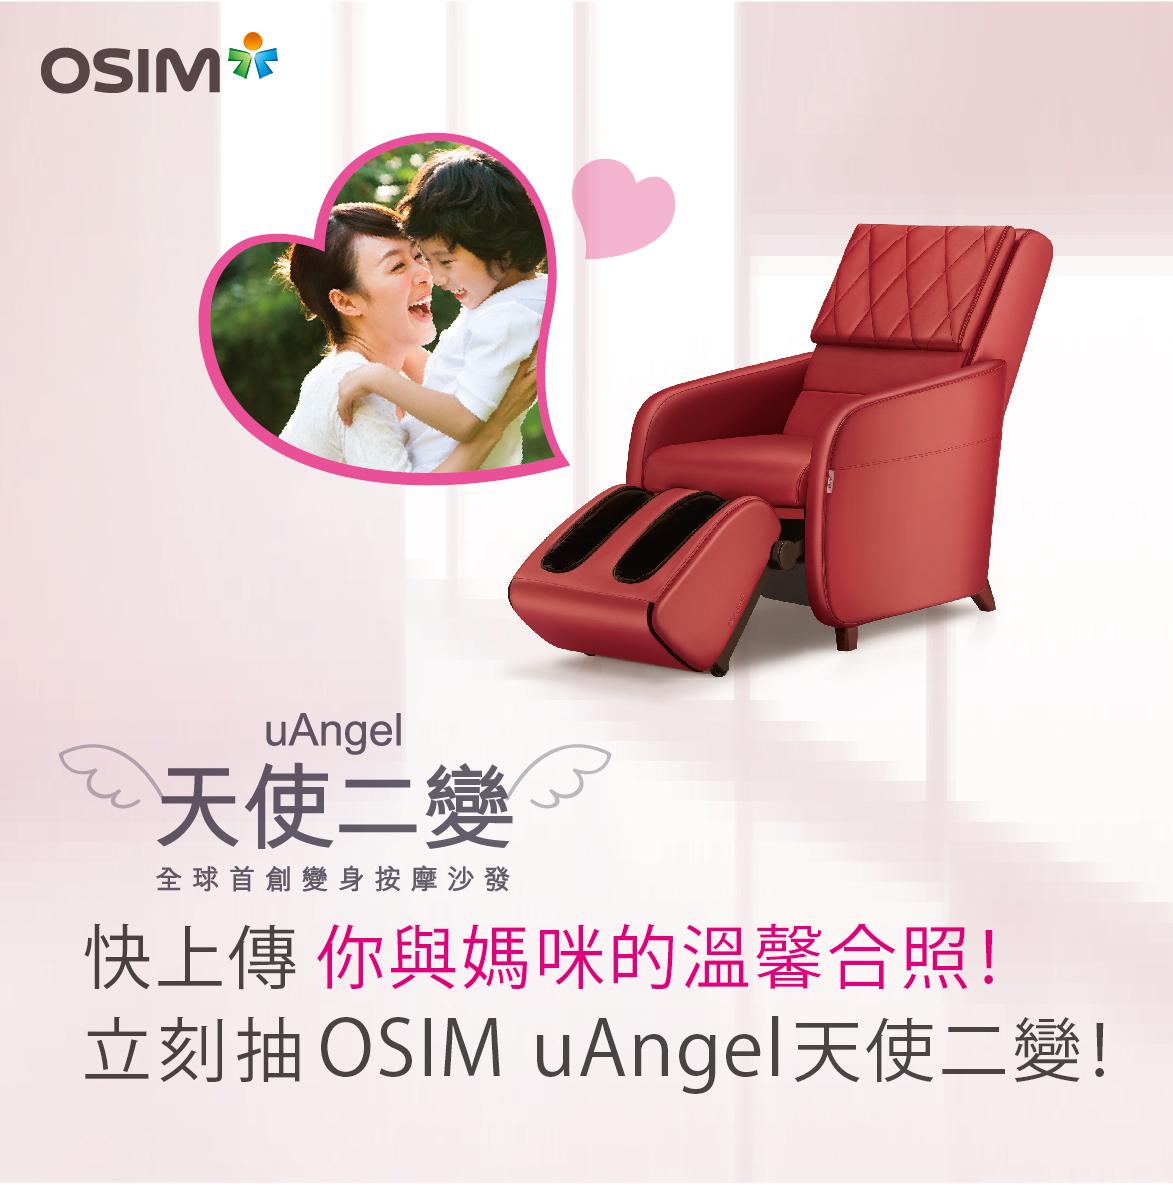 OSIM - BANNER2